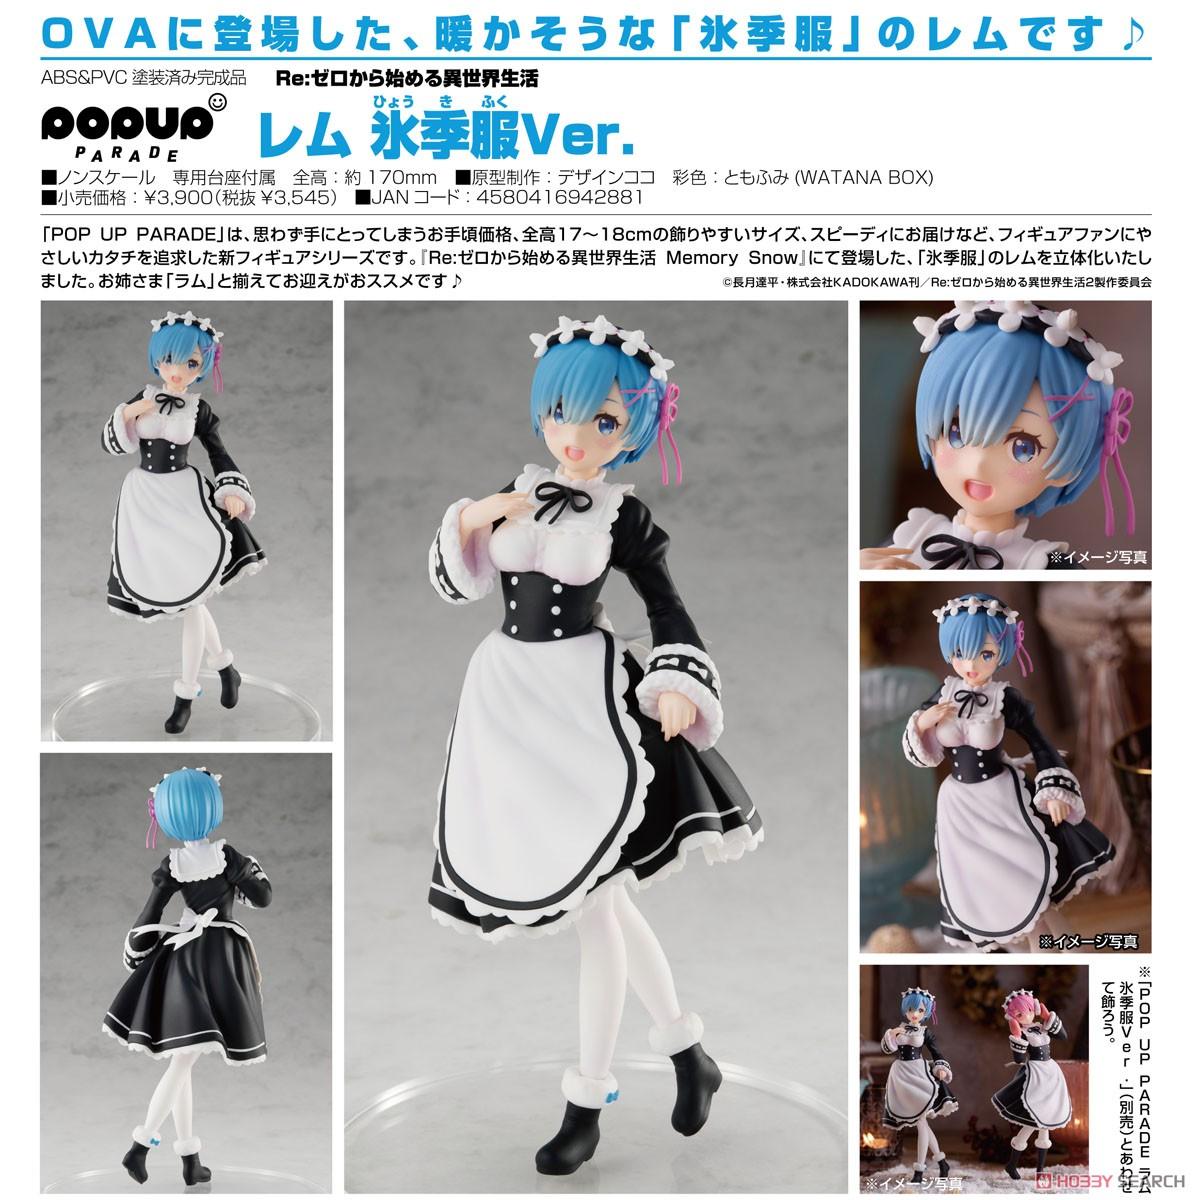 POP UP PARADE『レム 氷季服Ver.』Re:ゼロから始める異世界生活 完成品フィギュア-019